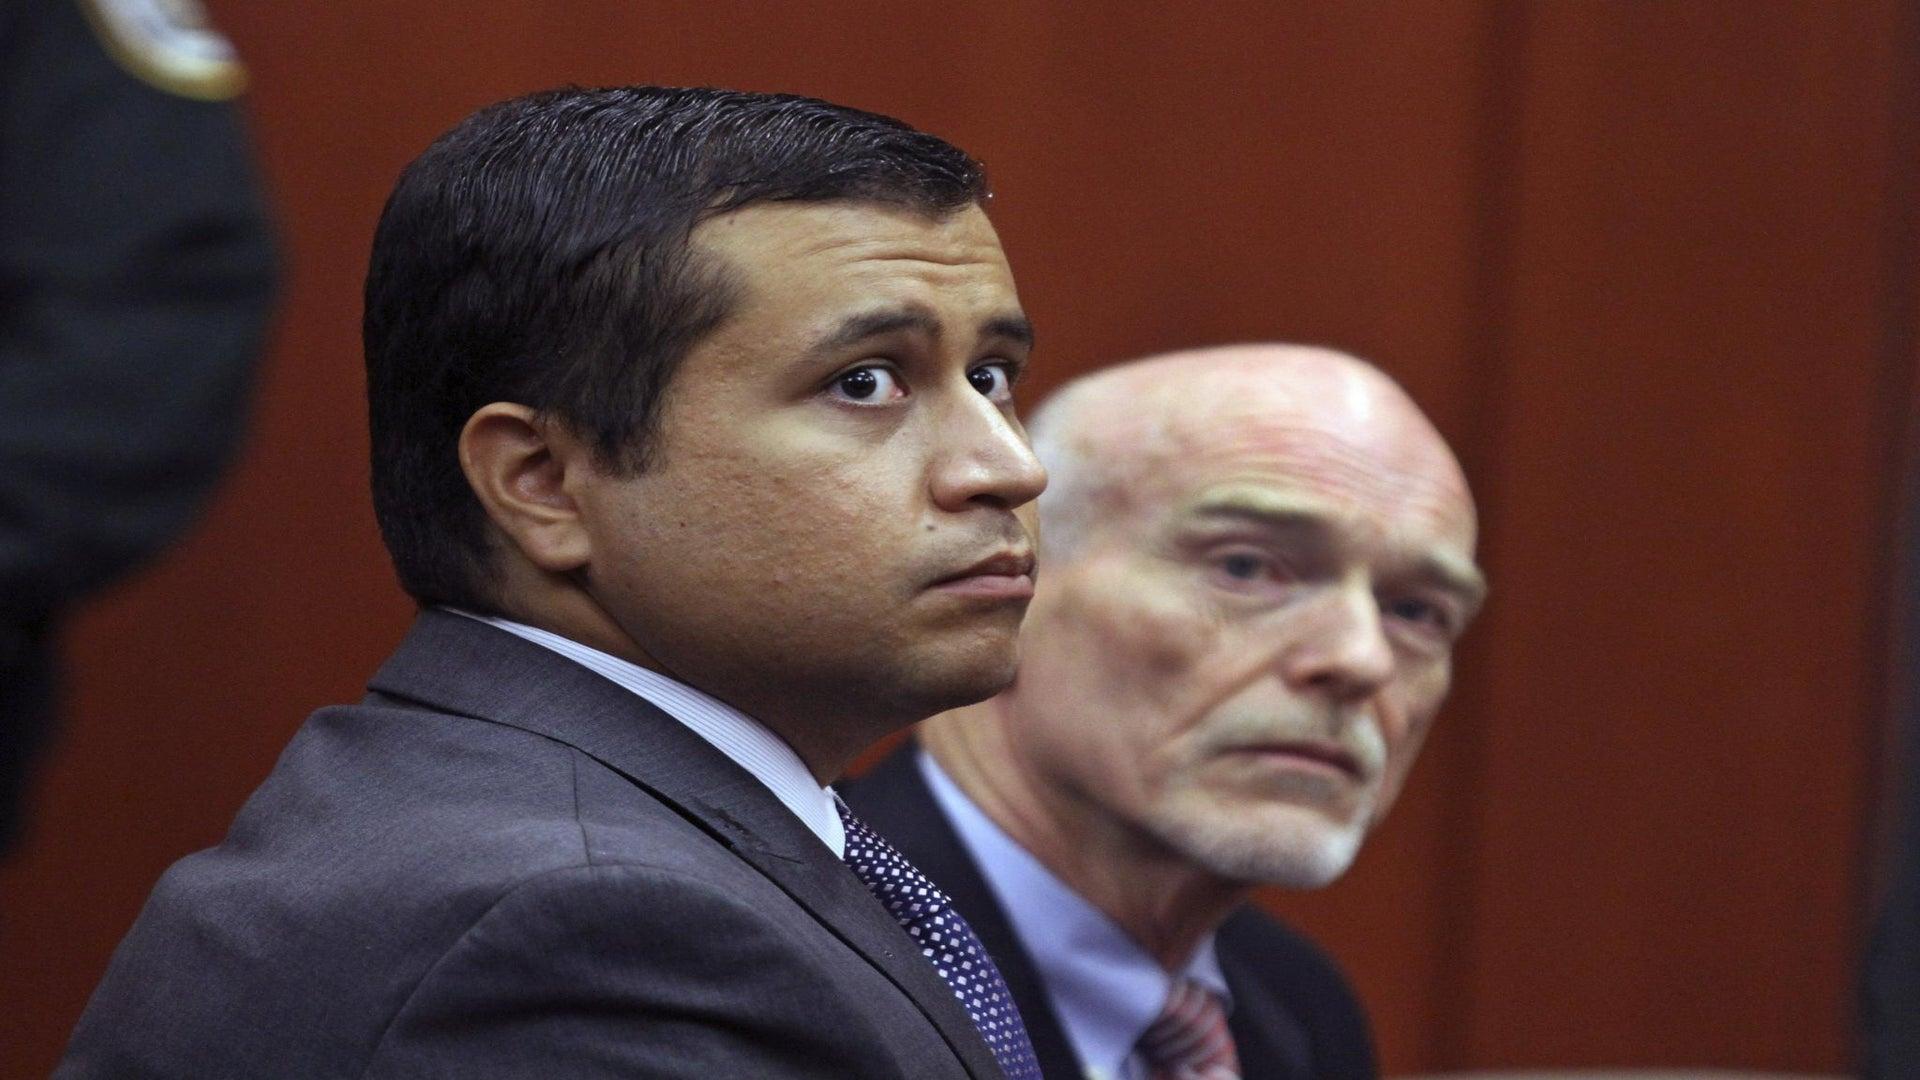 Judge Denies Request for Gag Order in George Zimmerman Case